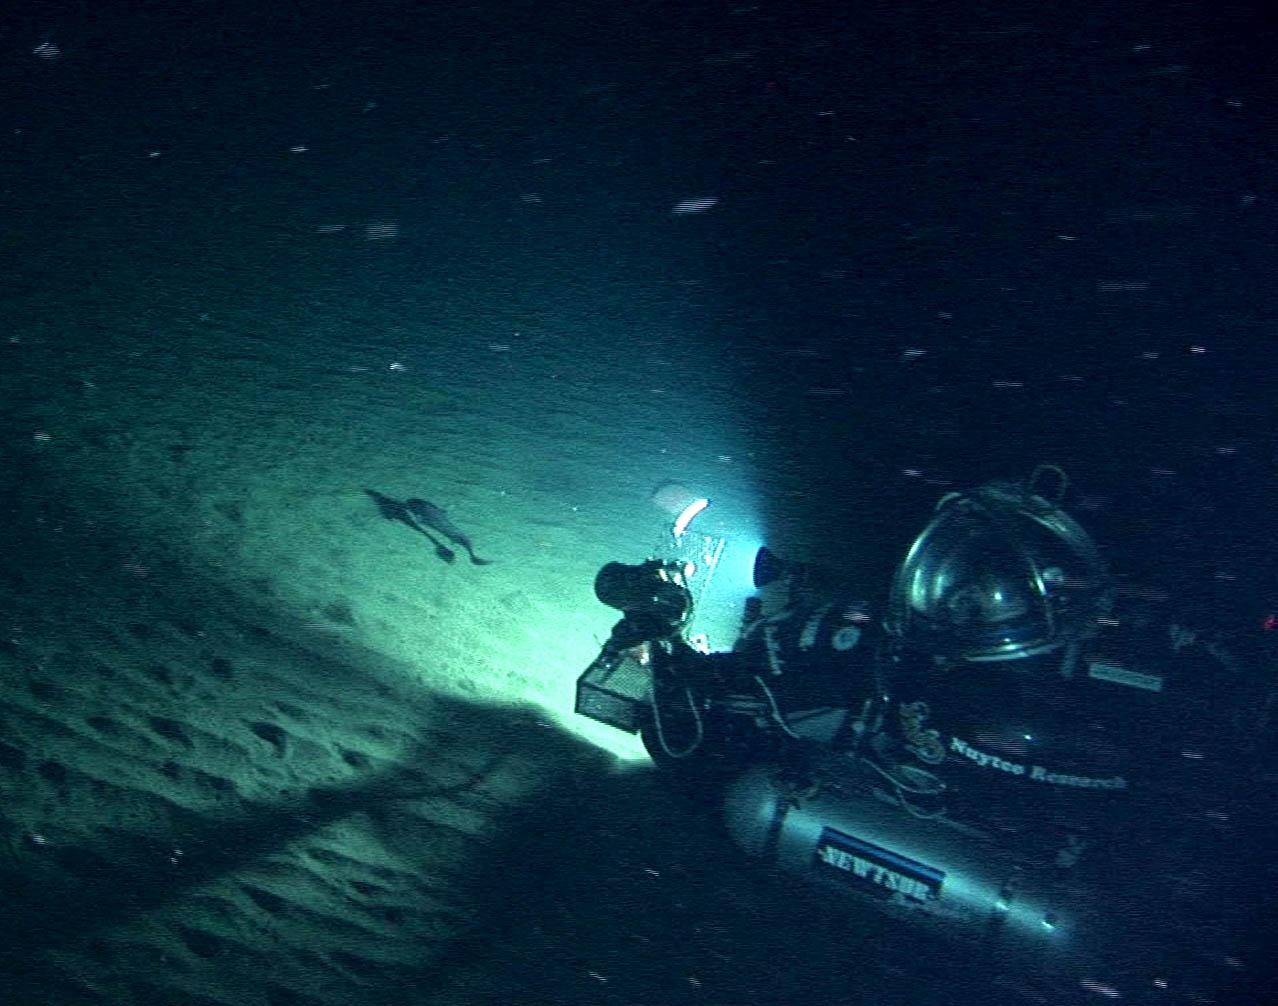 Deepworker submersible filming grenadier at bottom of Bering Sea, Alaska